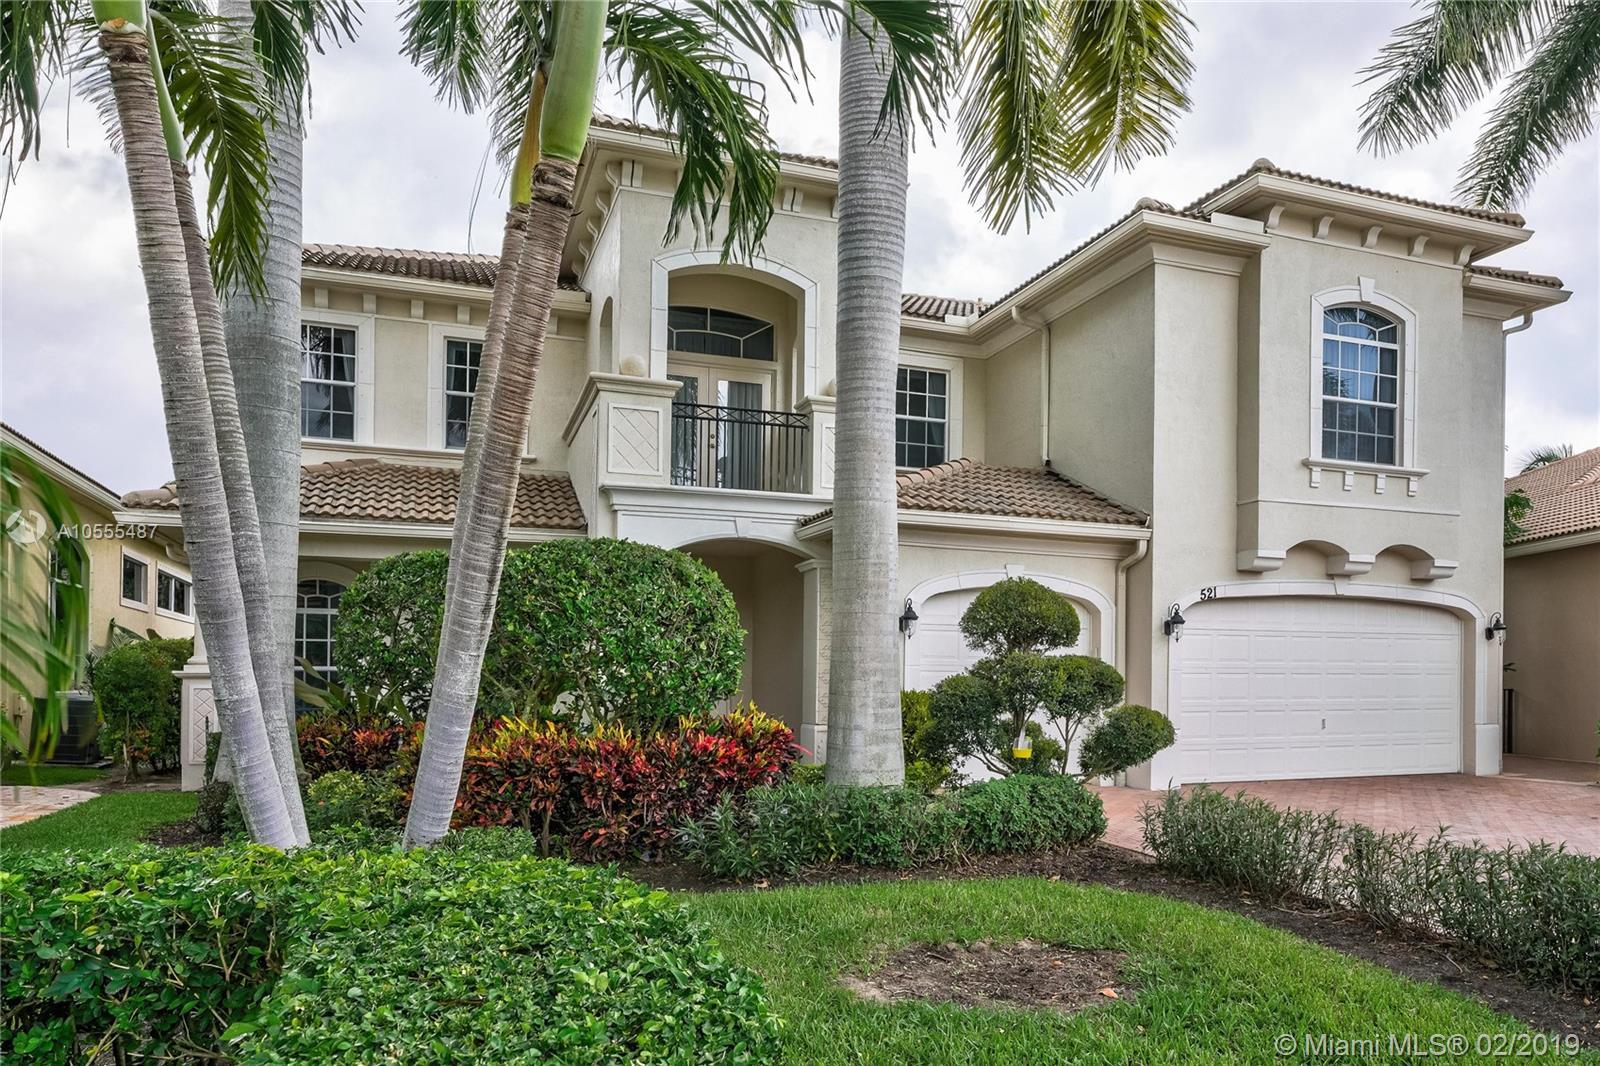 521 SE Les Jardin Dr, Palm Beach Gardens, FL 33410